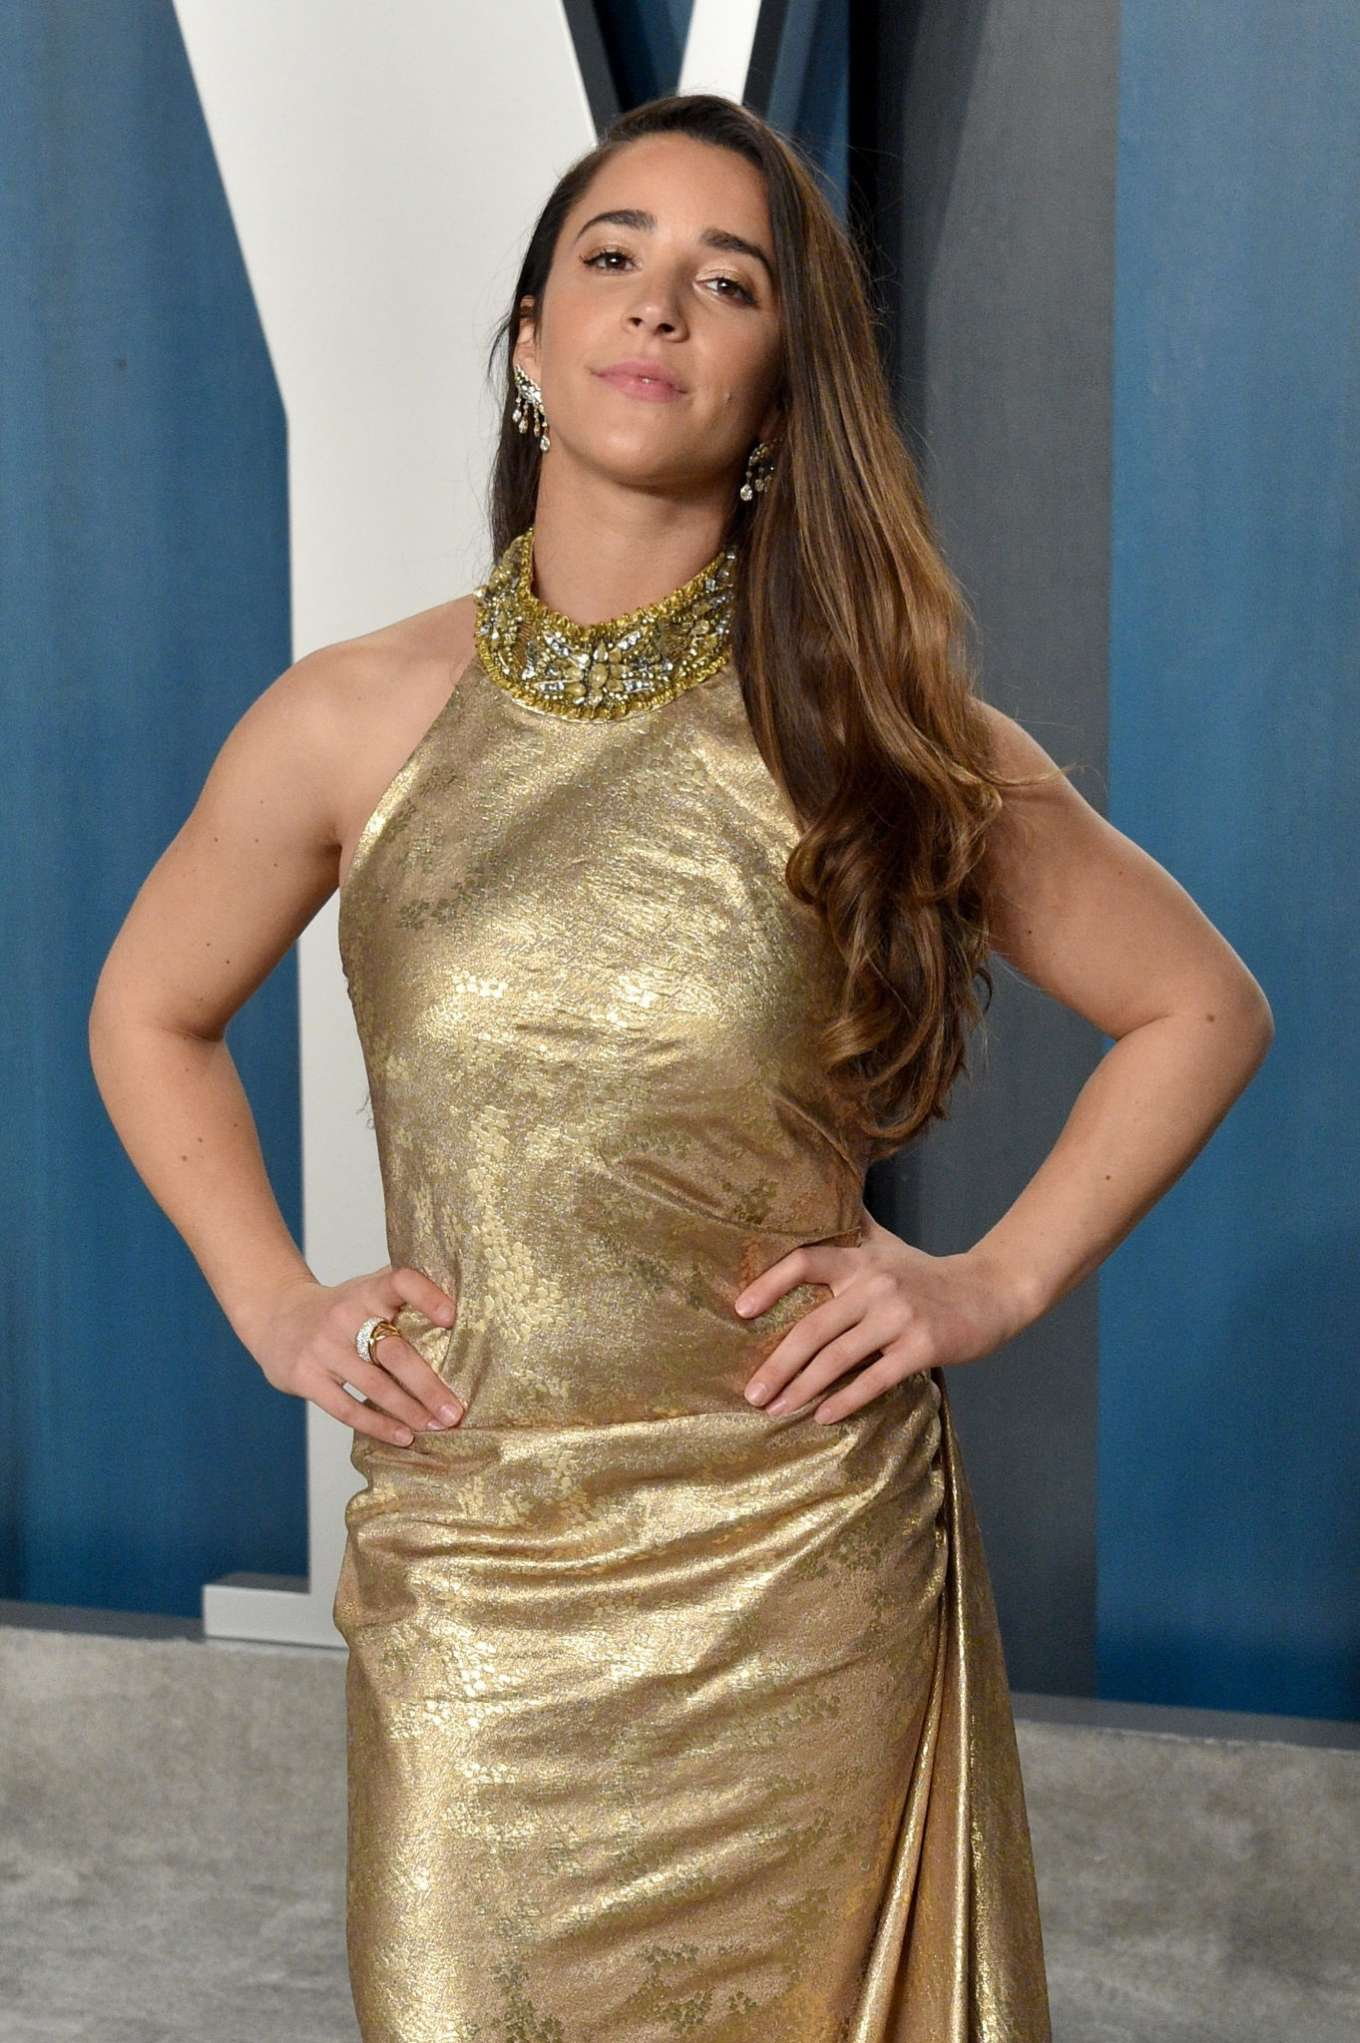 Aly Raisman - 2020 Vanity Fair Oscar Party in Beverly Hills